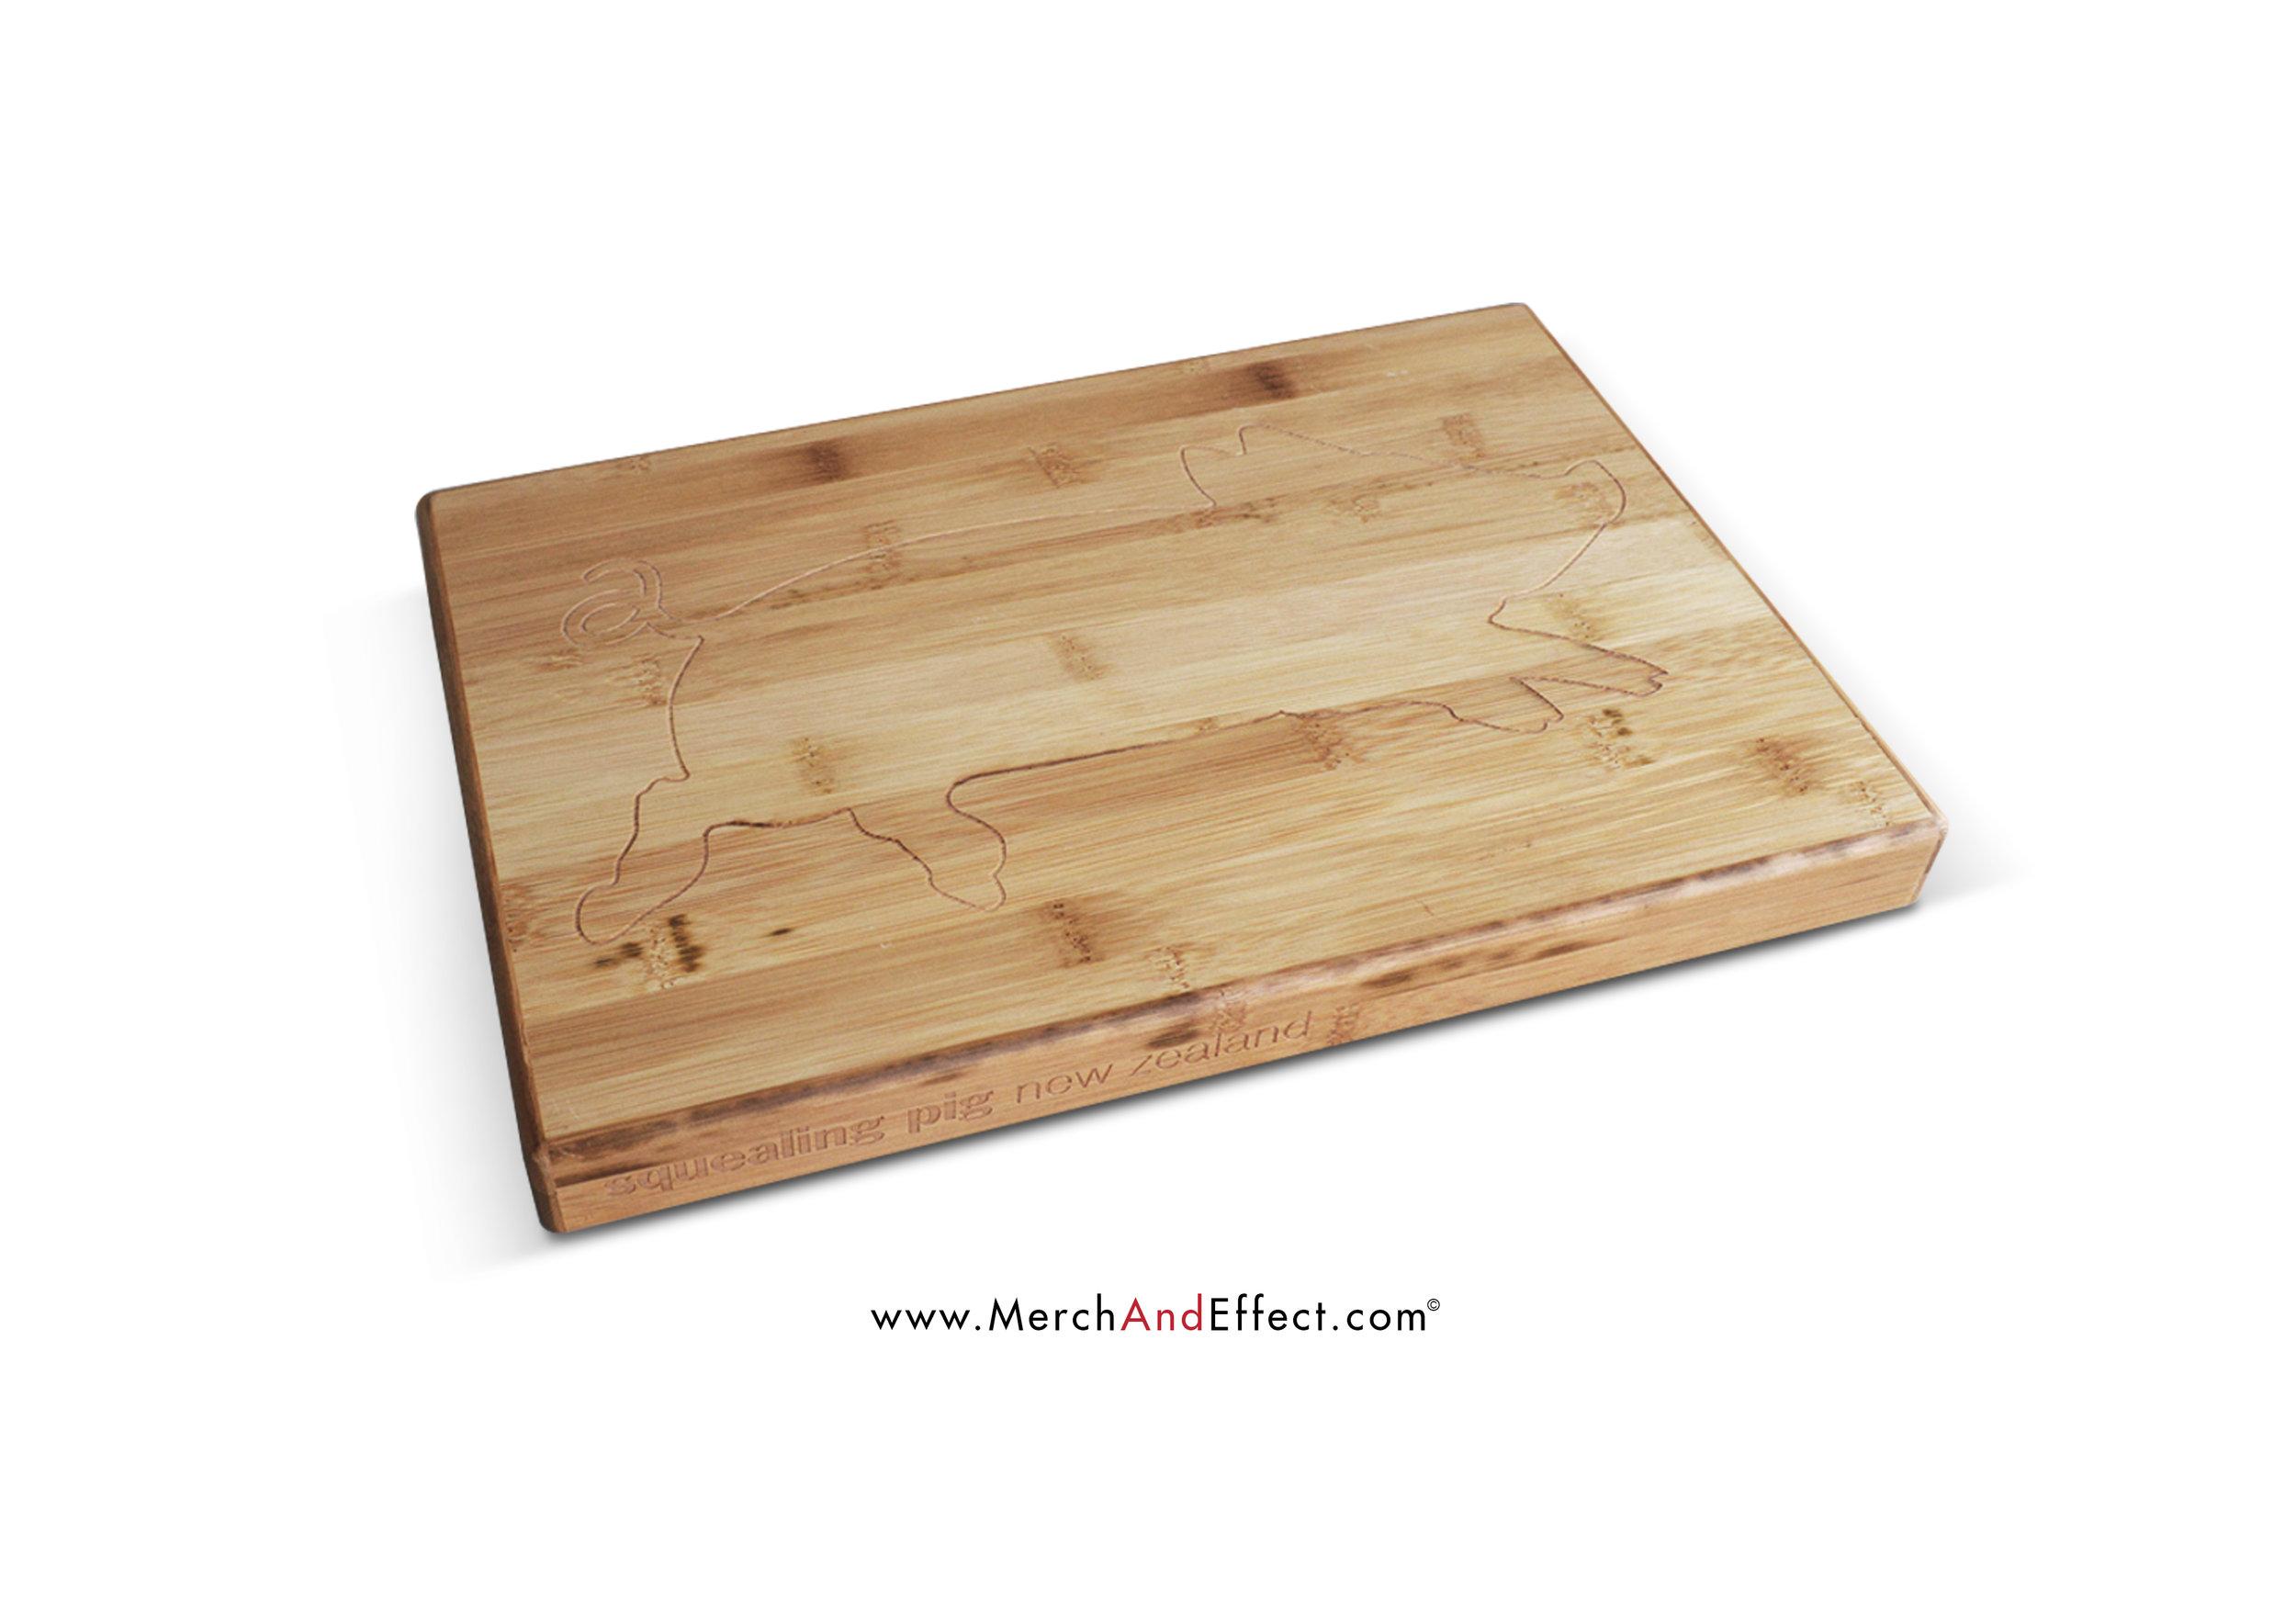 Squealing Pig Chopping Board.jpg